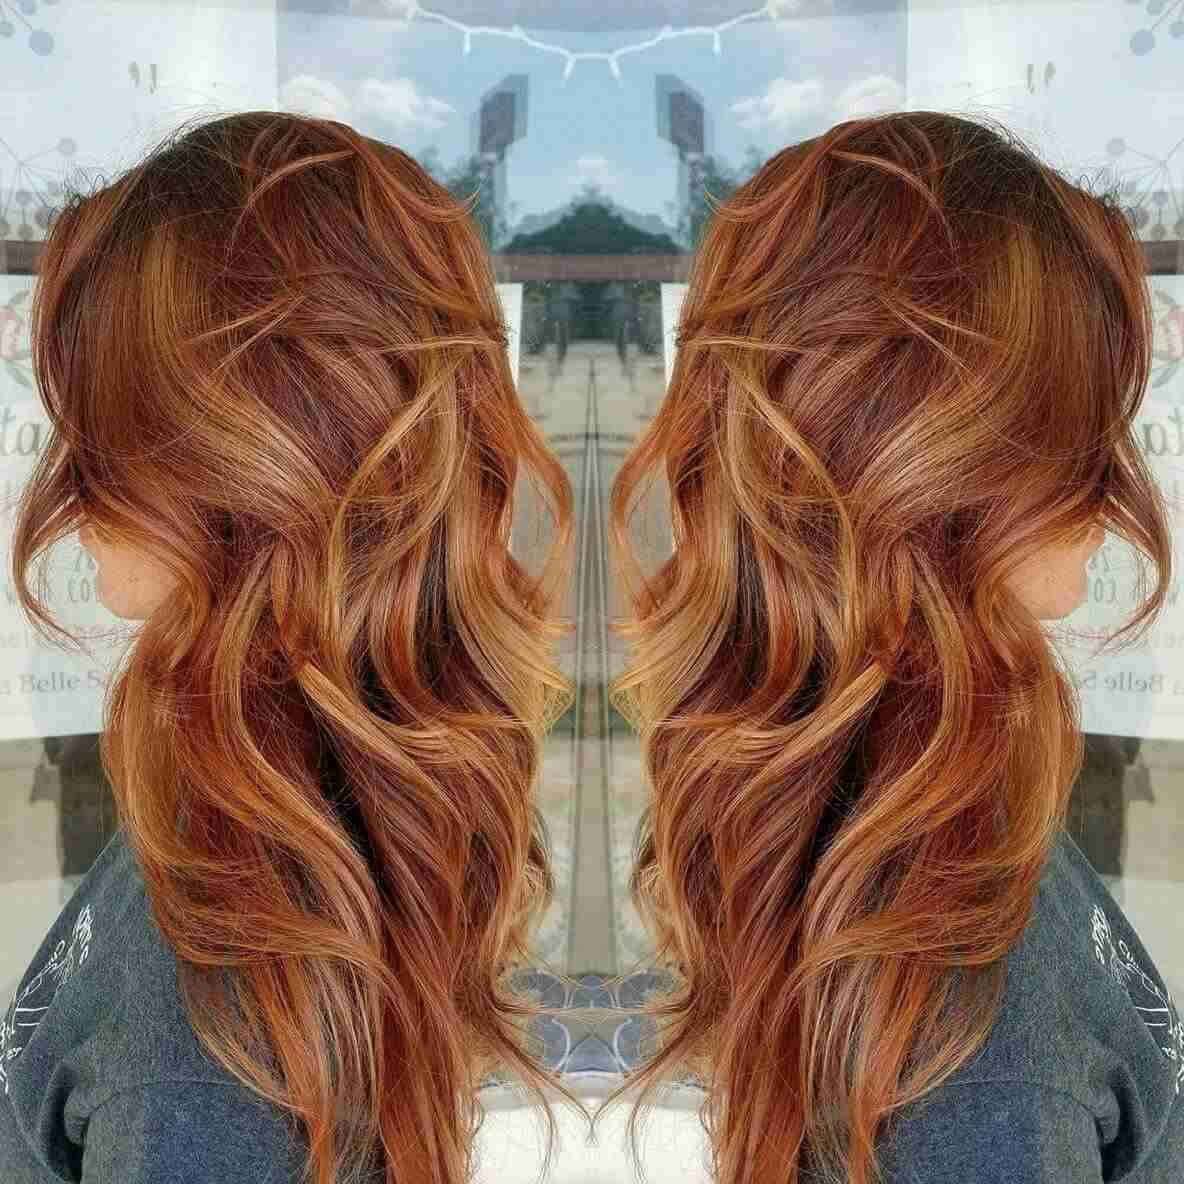 Balayage Rot Blond Haartrend Kupferrot Haarfarbe Highlights